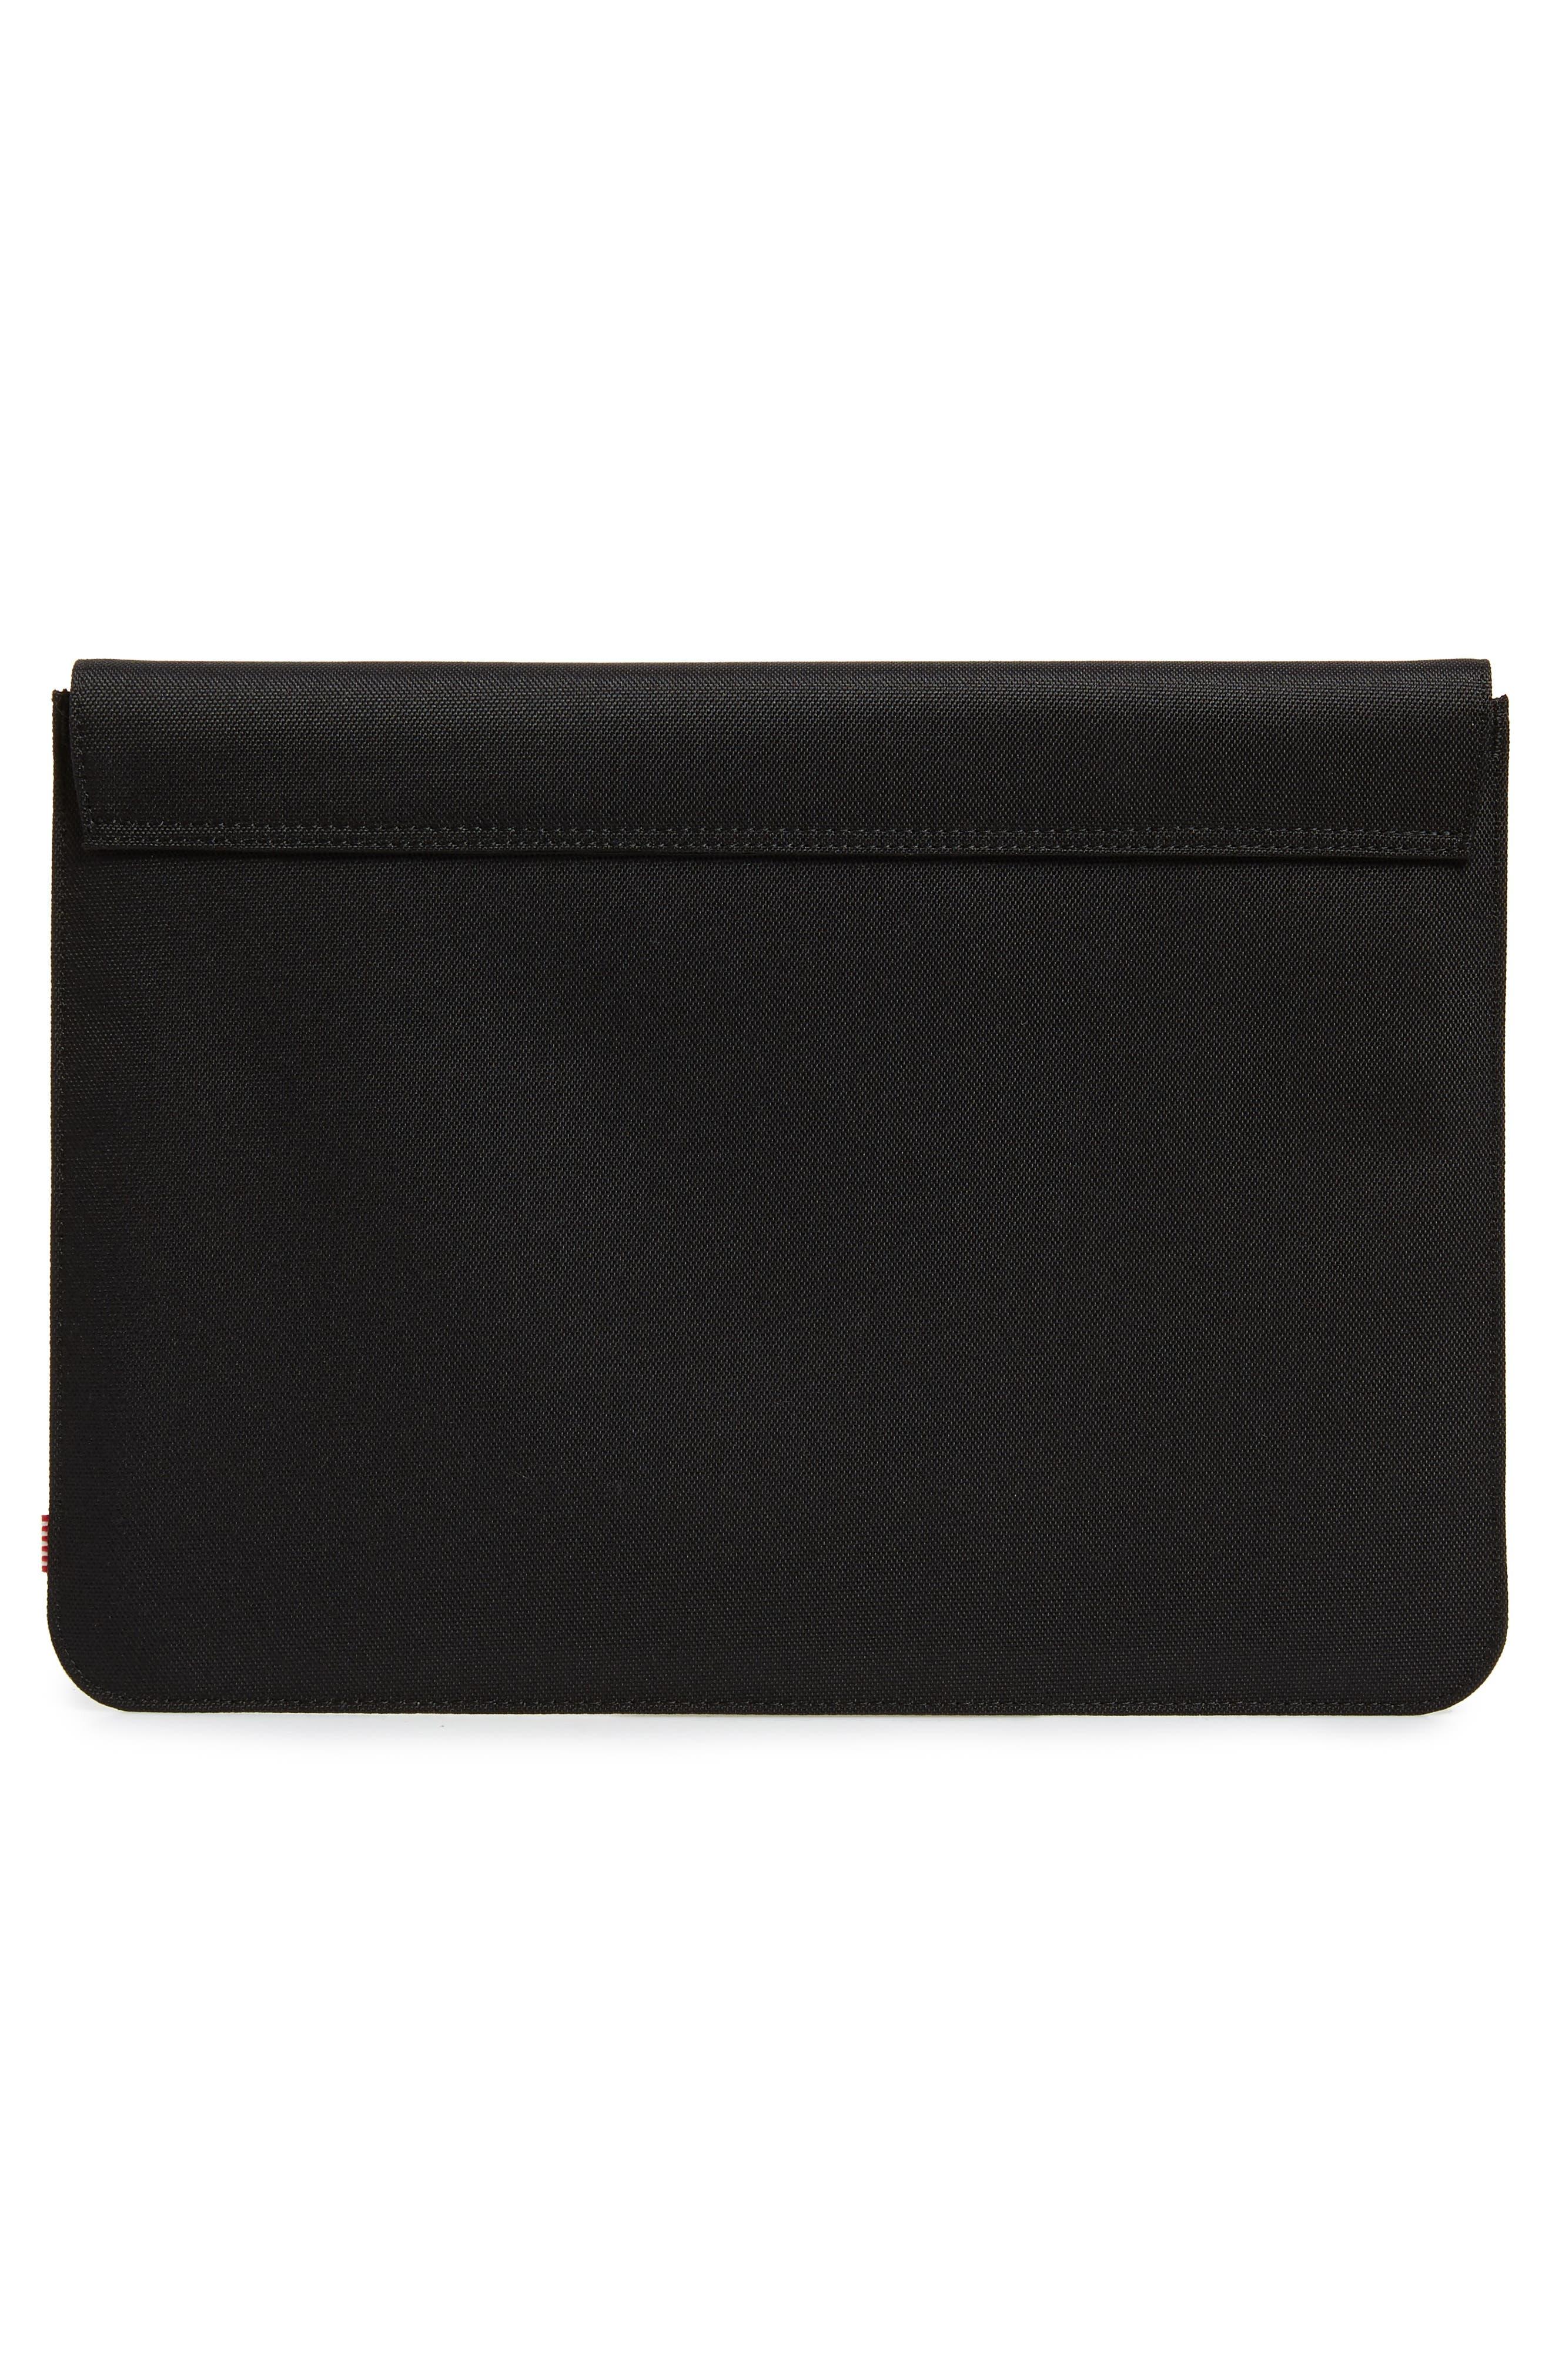 Spokane 13-Inch MacBook Canvas Sleeve,                             Alternate thumbnail 4, color,                             BLACK